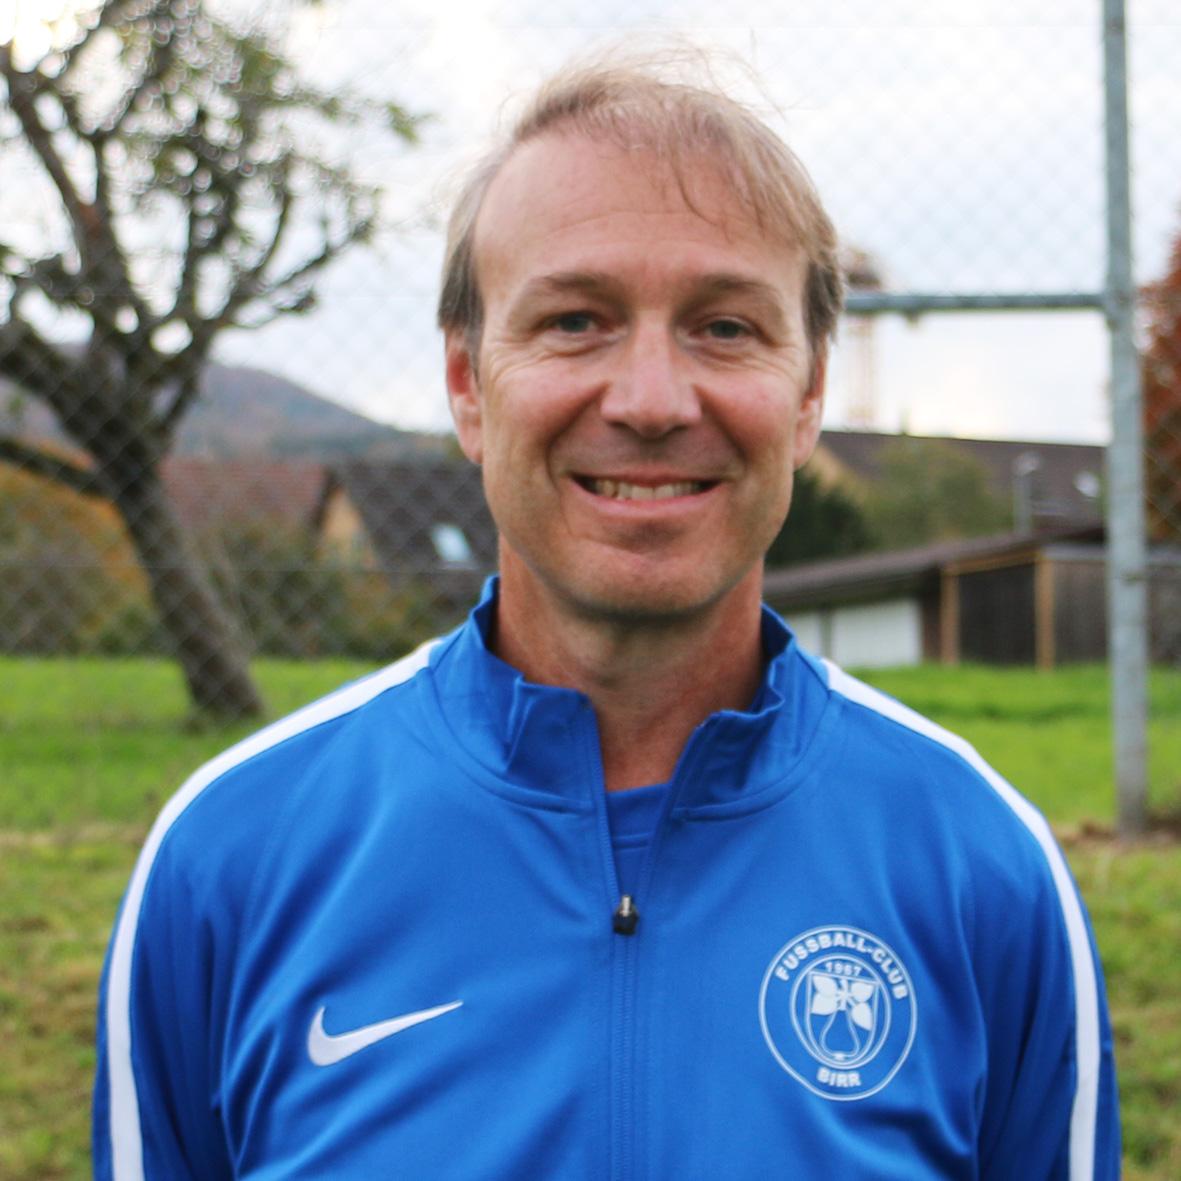 Markus Hung